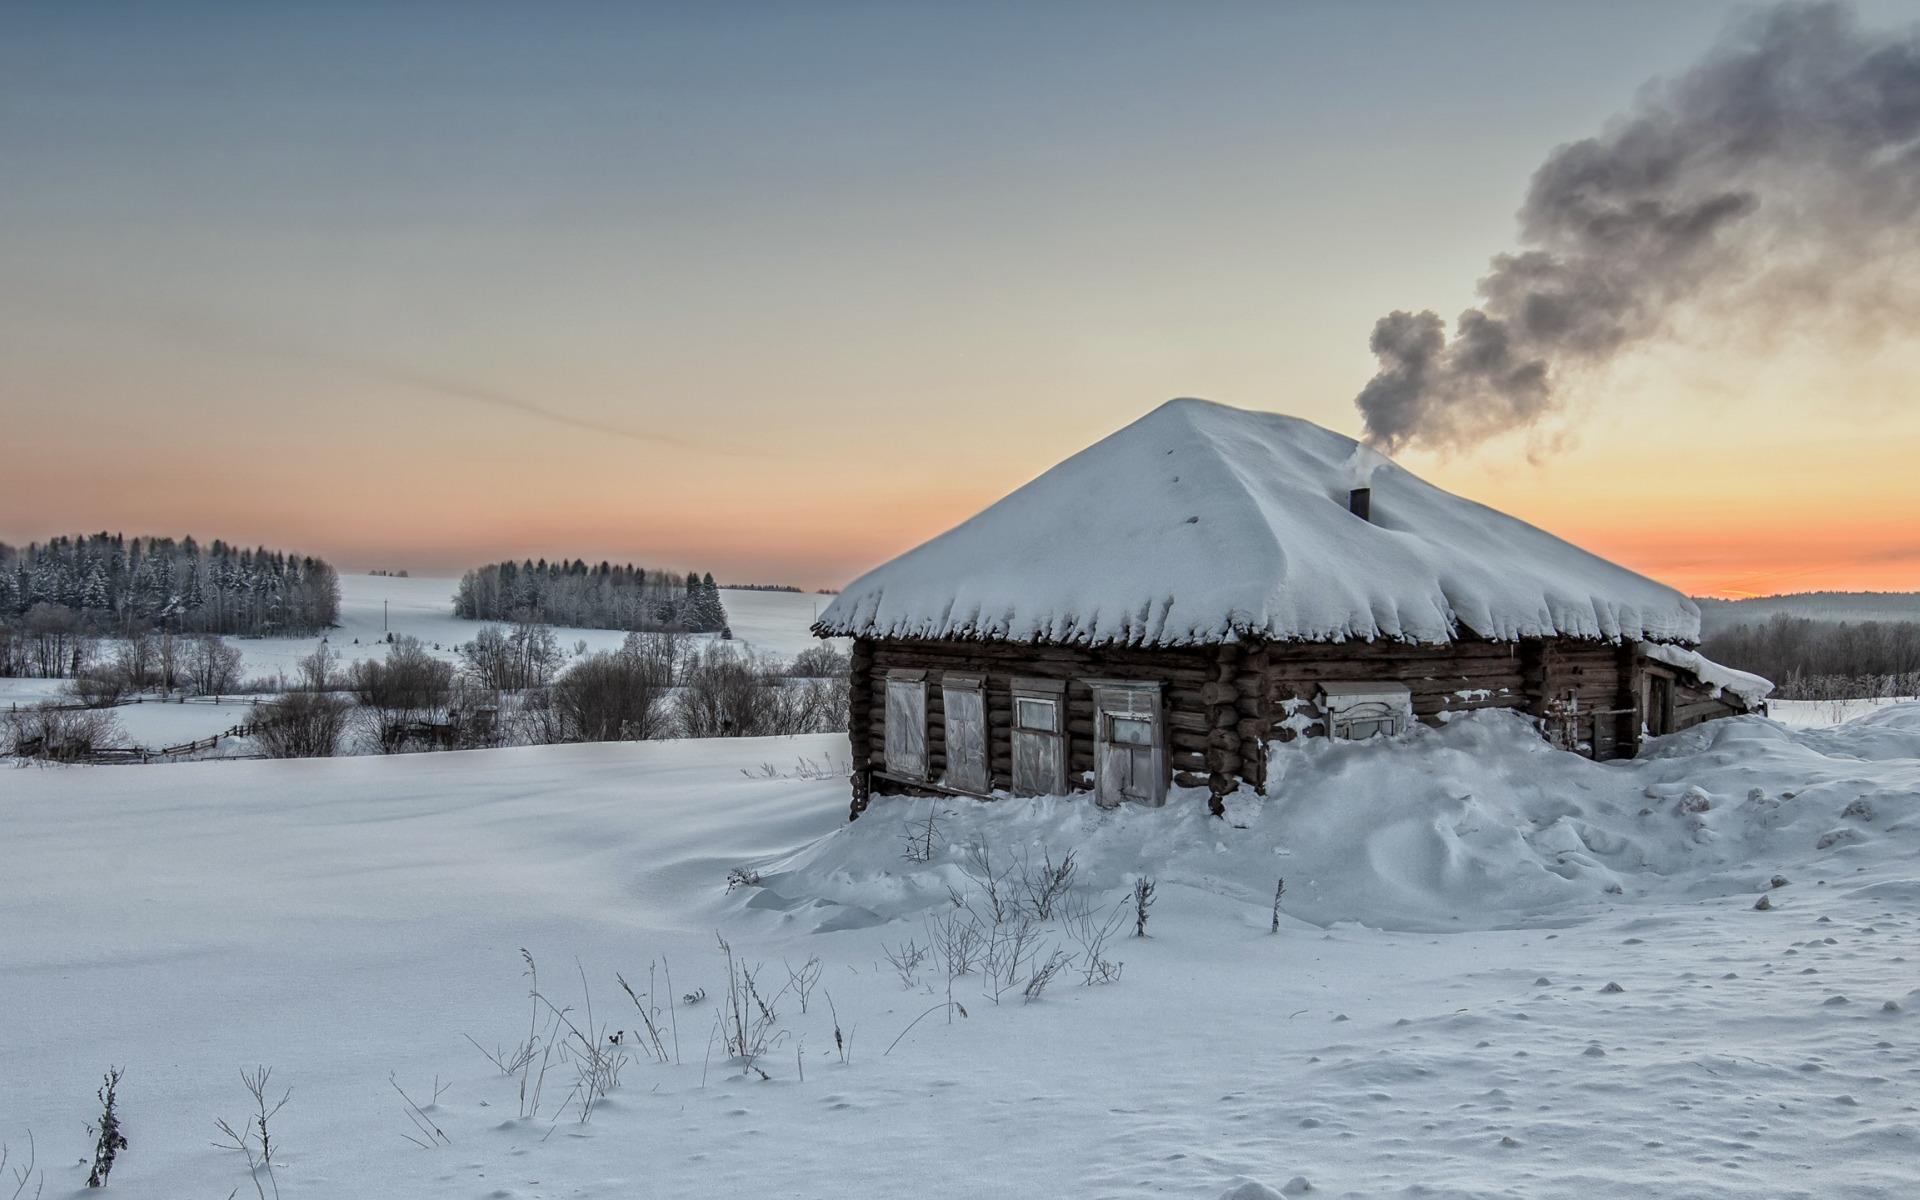 картинки на рабочий стол заснеженная деревня русский музей